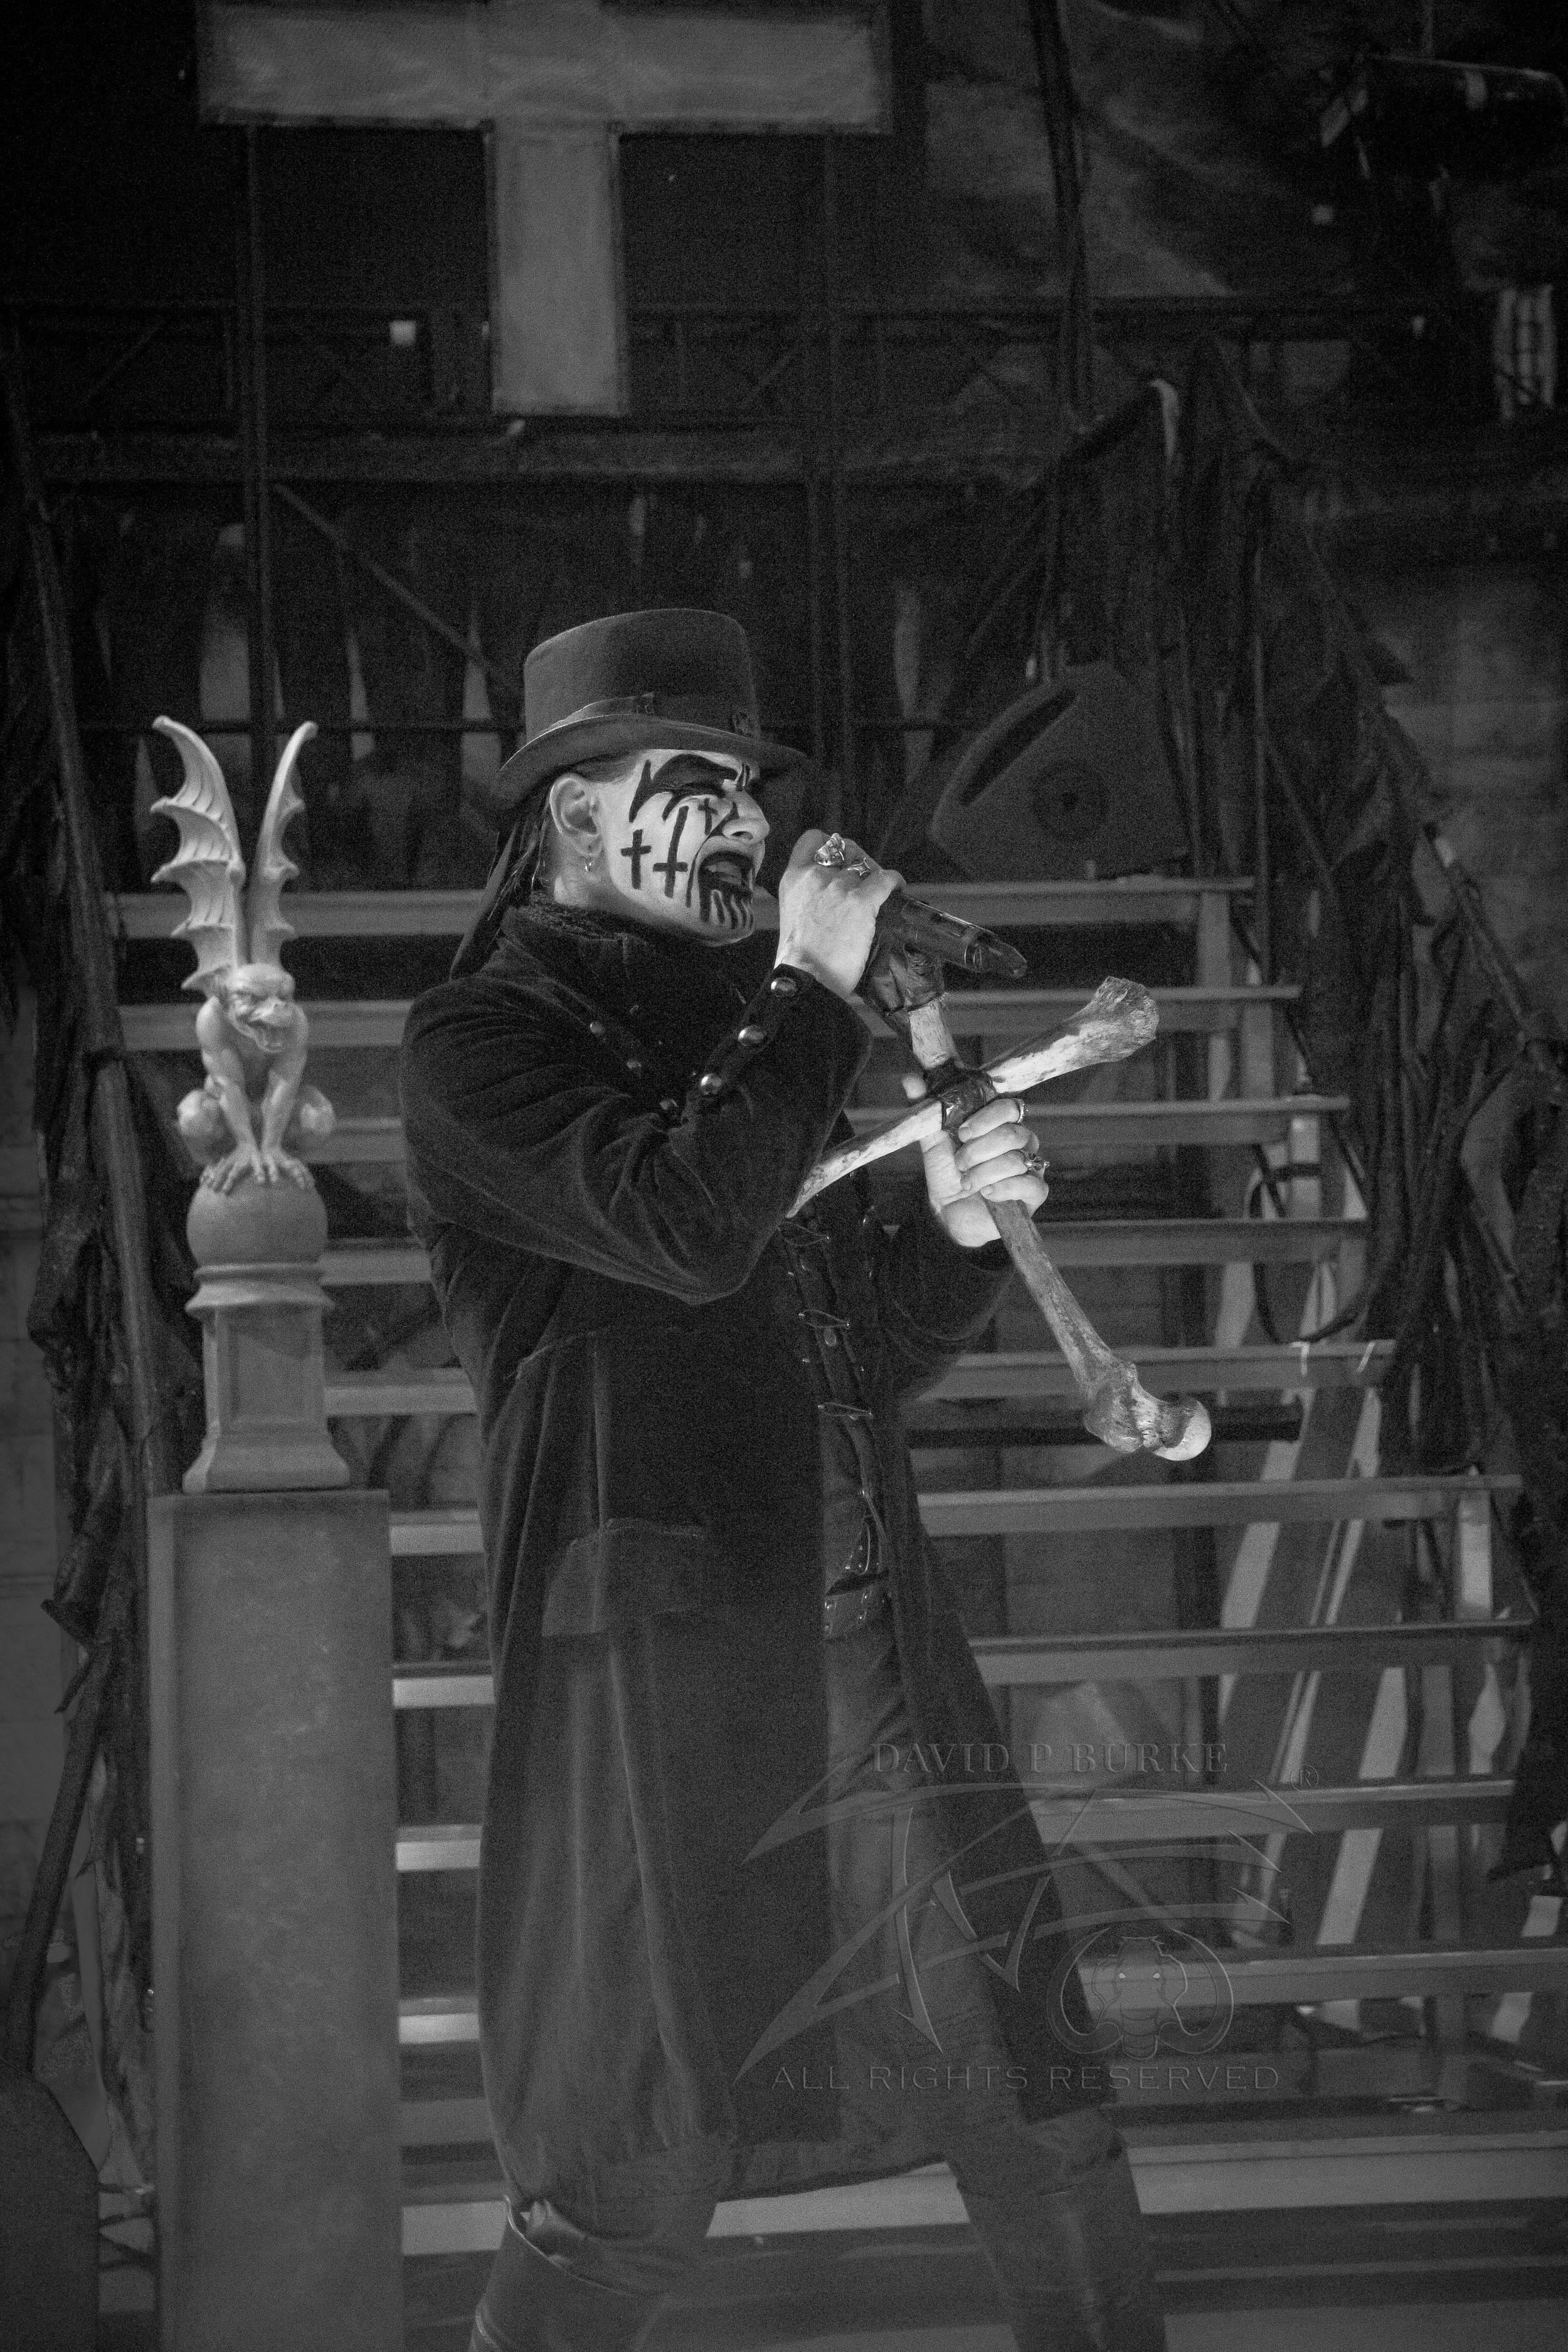 King Diamond  photo: David Burke